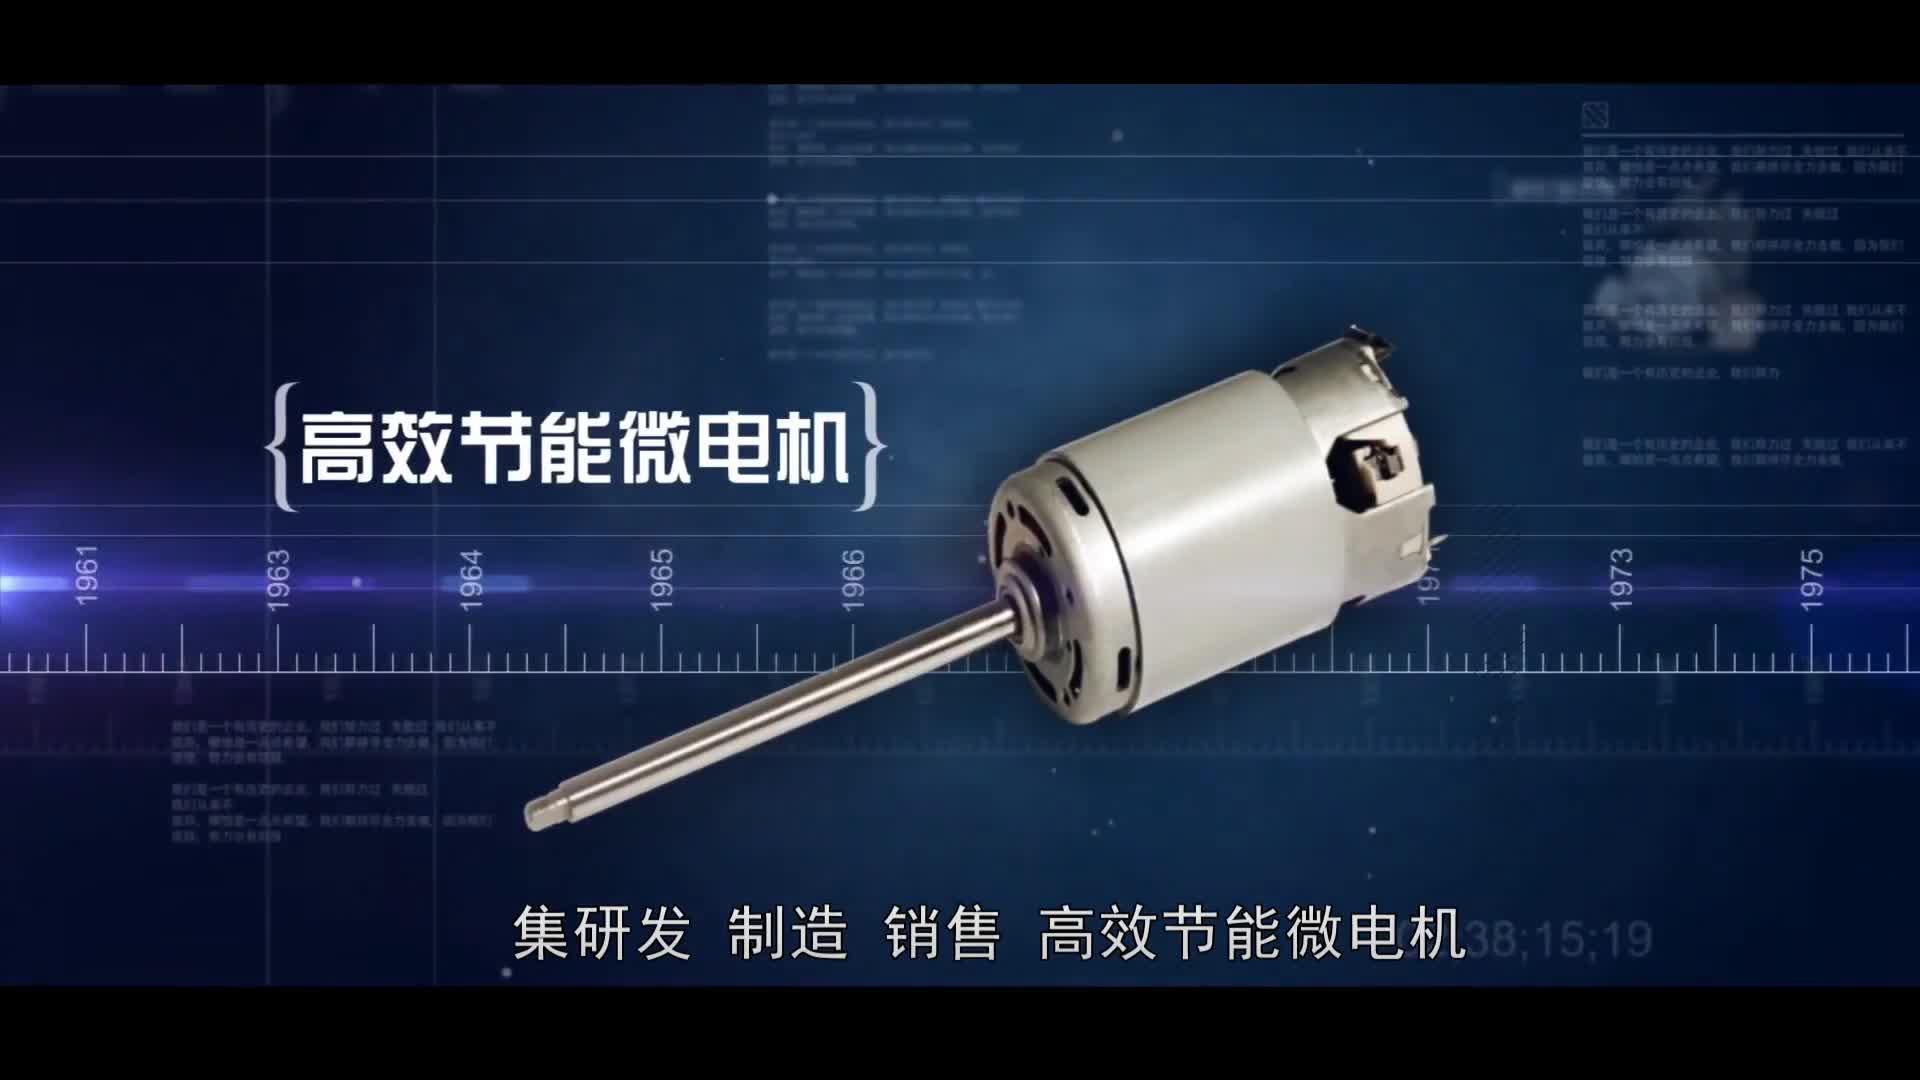 18 V 12 v brushless dc มอเตอร์ 300 w สำหรับค้อนไฟฟ้ามอเตอร์จีน (แผ่นดินใหญ่)